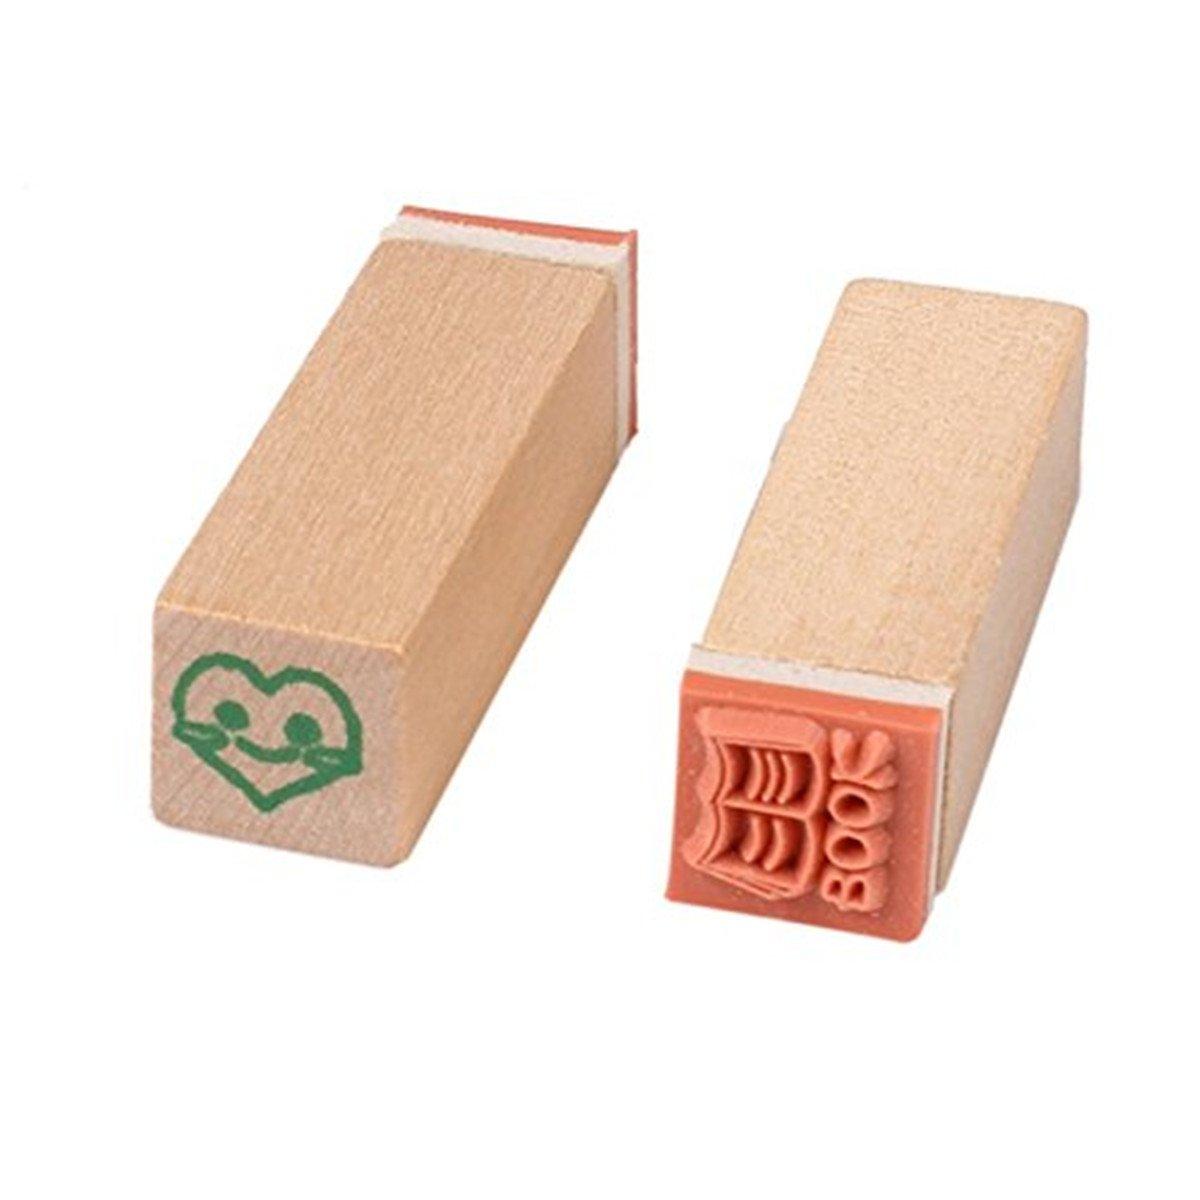 B Yansanido 12pcs Mini Cute DIY Diary Wooden Rubber Stamp Set with Wooden Box